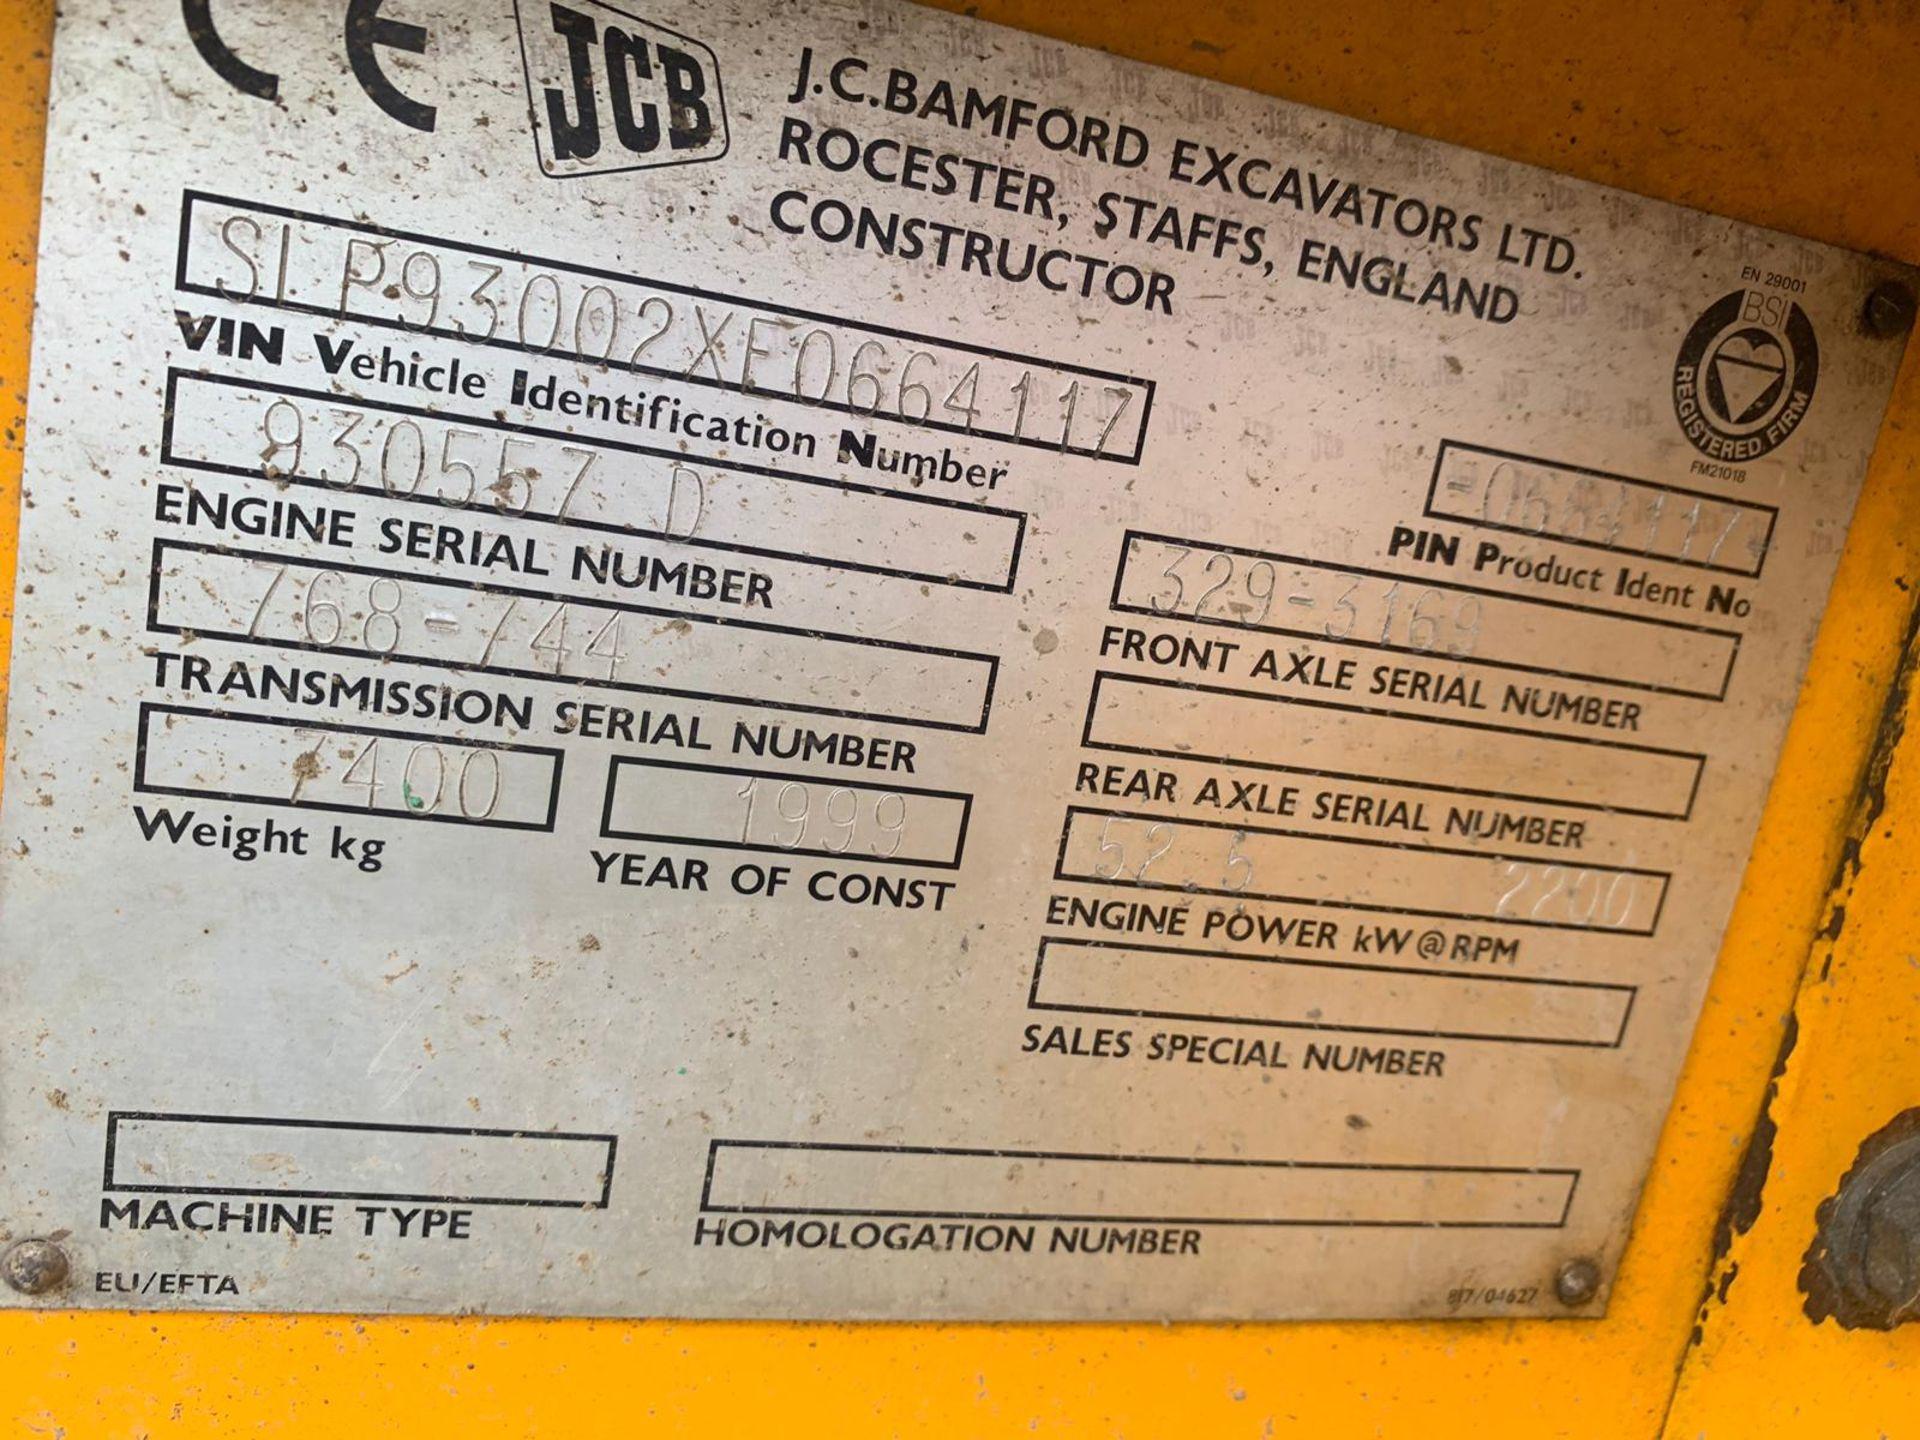 Lot 67 - 1999 JCB 930 ROUGH TERRAIN FORKLIFT *PLUS VAT*